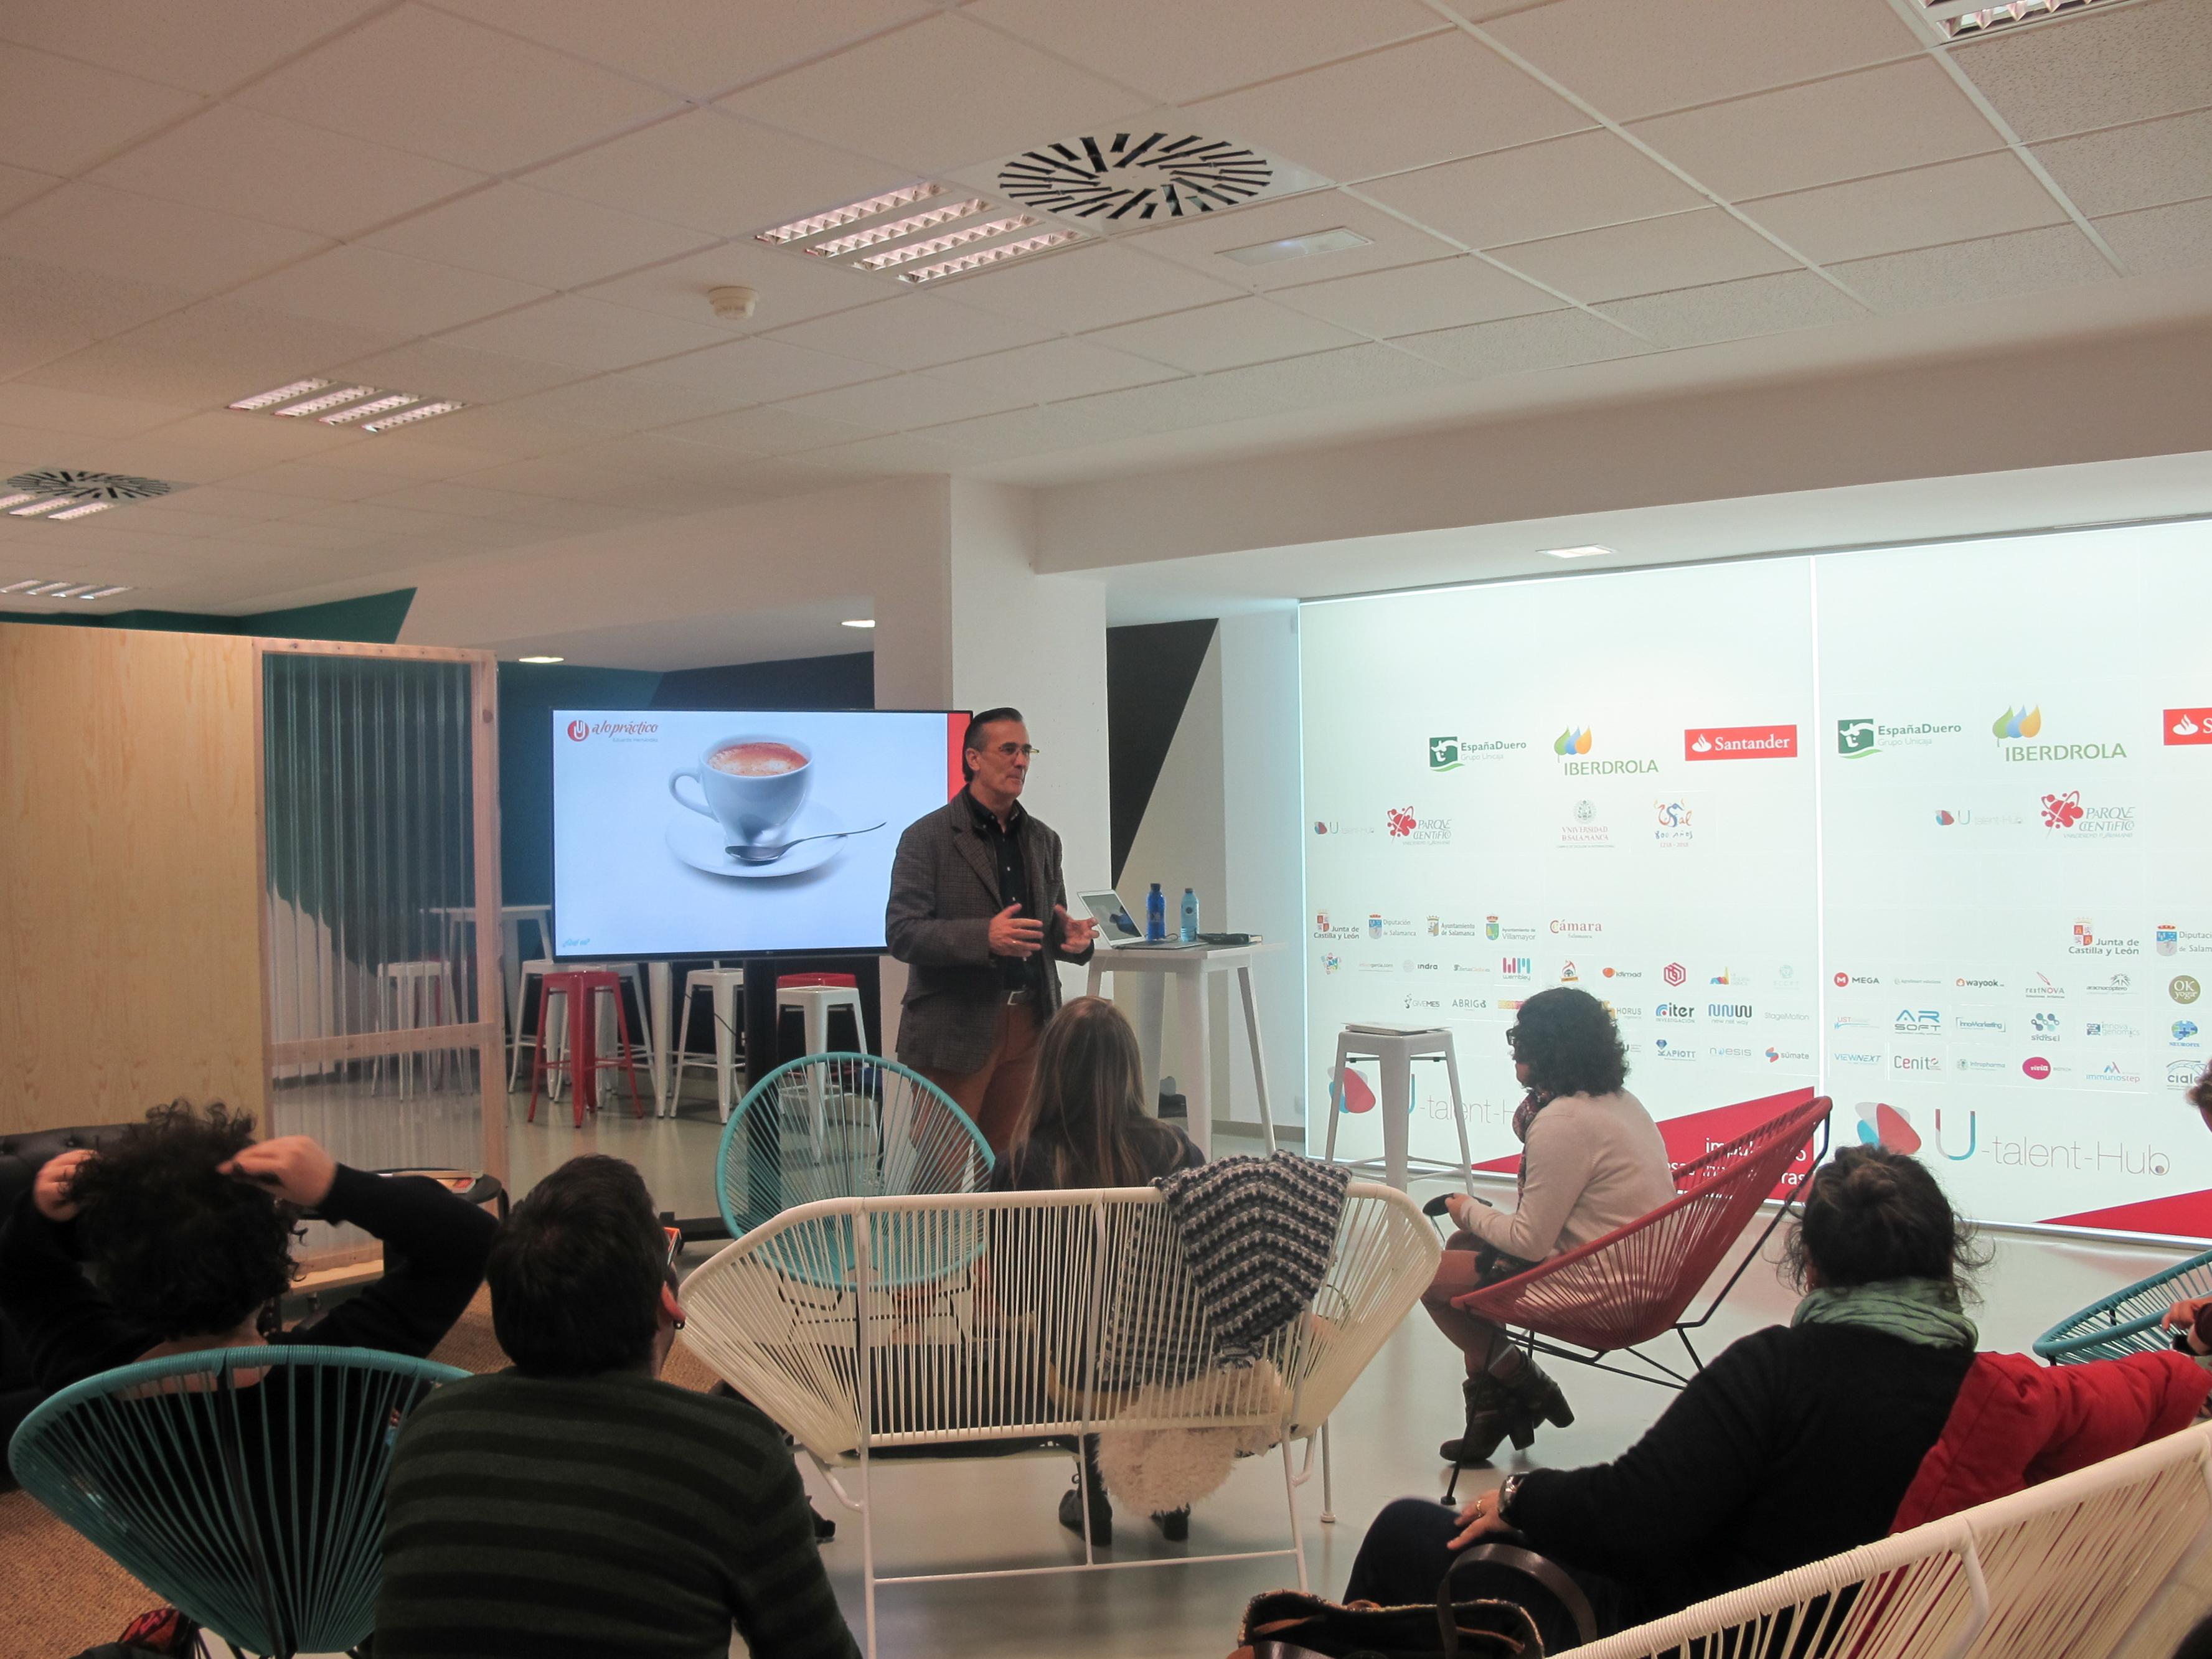 El U-Talent-Hub del Parque Científico de la USAL acogió un taller de 'Iniciación al Mindfulness'